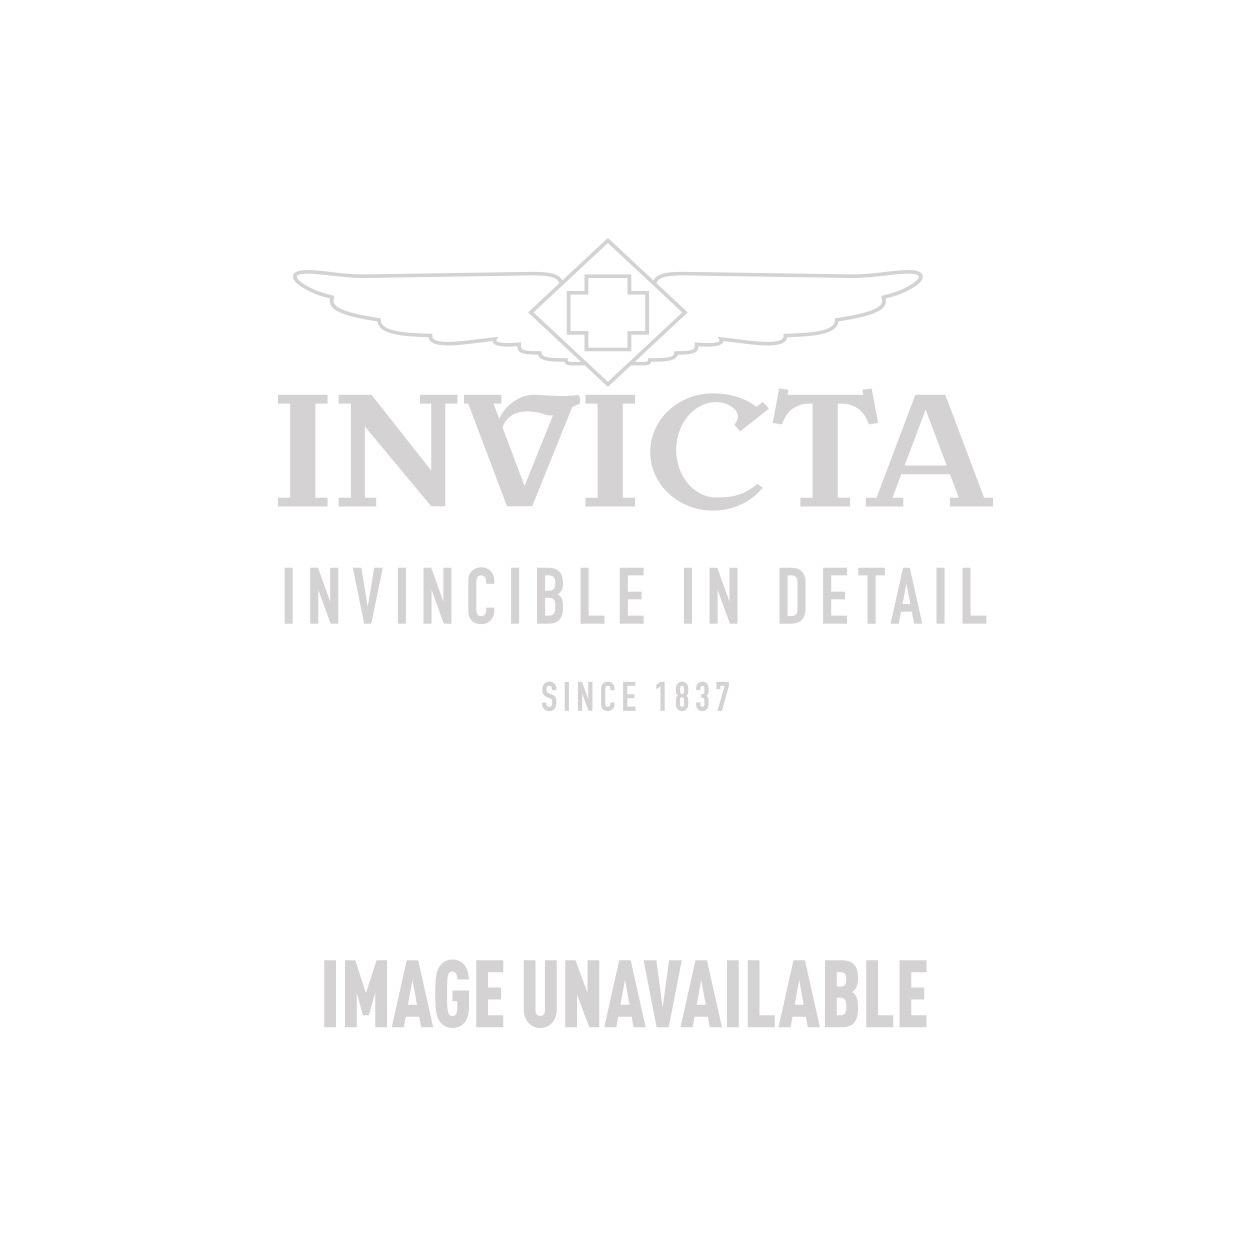 Invicta Corduba Swiss Movement Quartz Watch - Gold case with Gold, Blue tone Stainless Steel, Polyurethane band - Model 19236